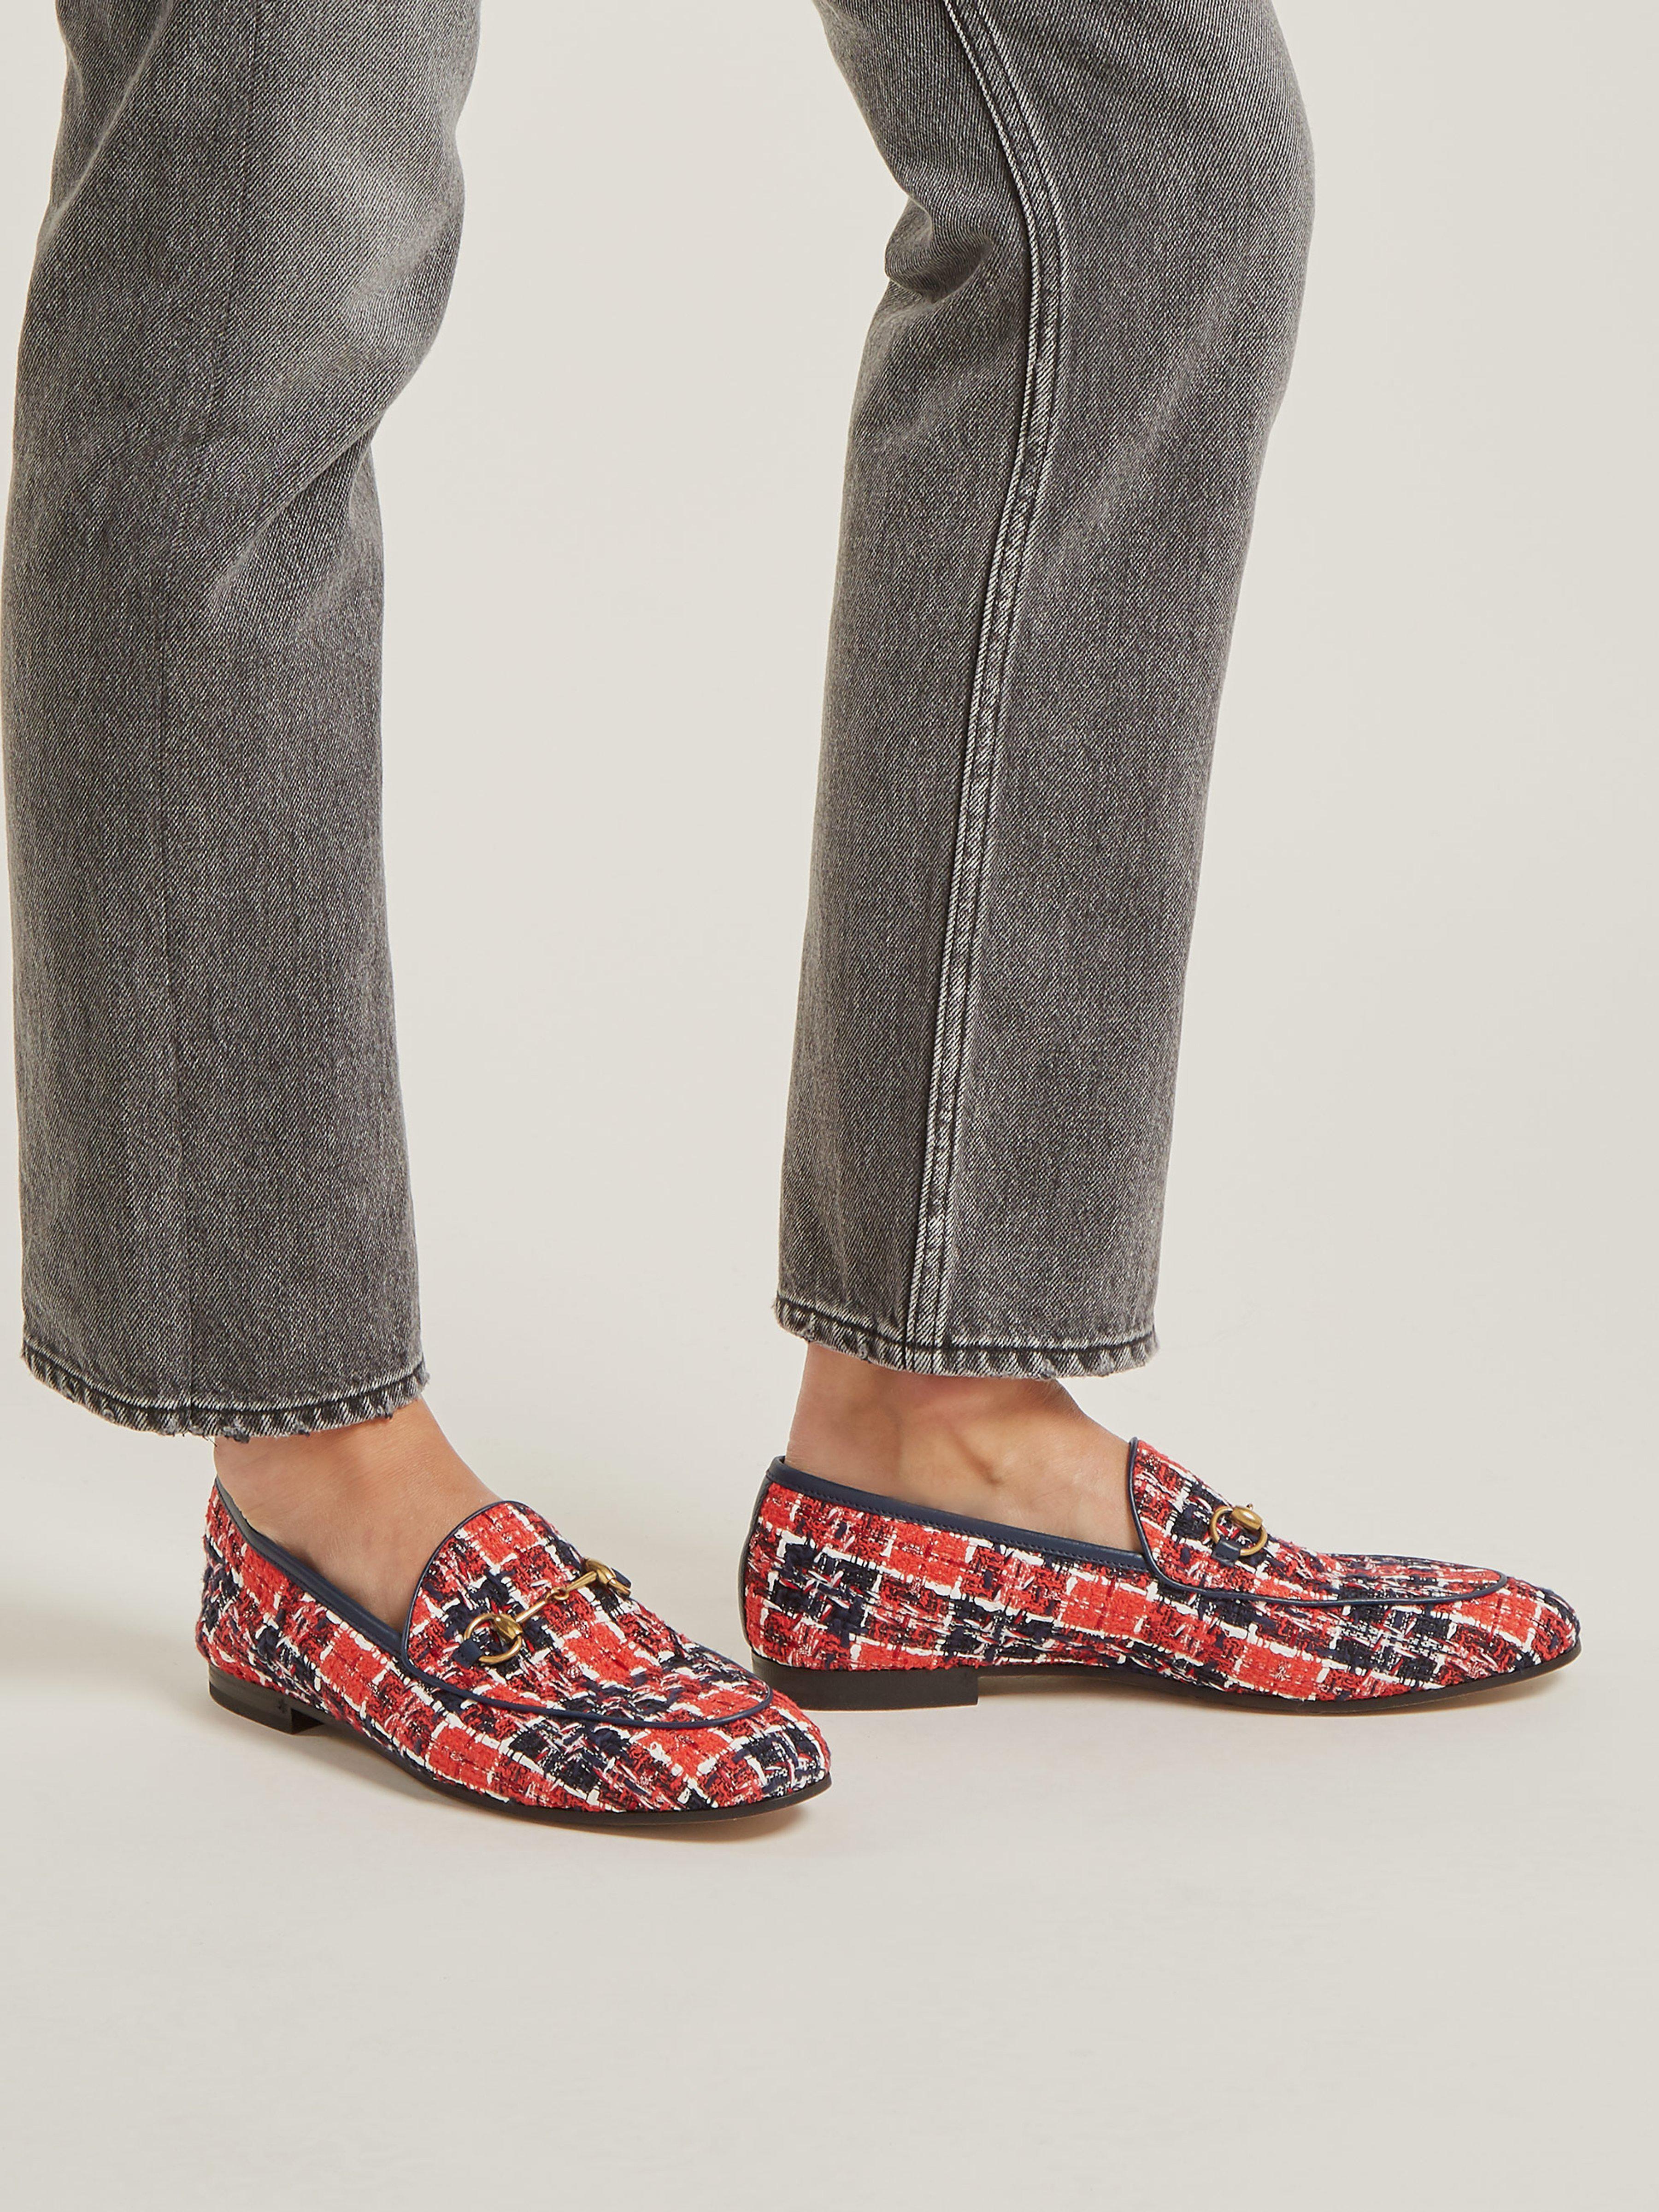 ea64b4ceabc Gucci - Red Jordaan Check Tweed Loafers - Lyst. View fullscreen